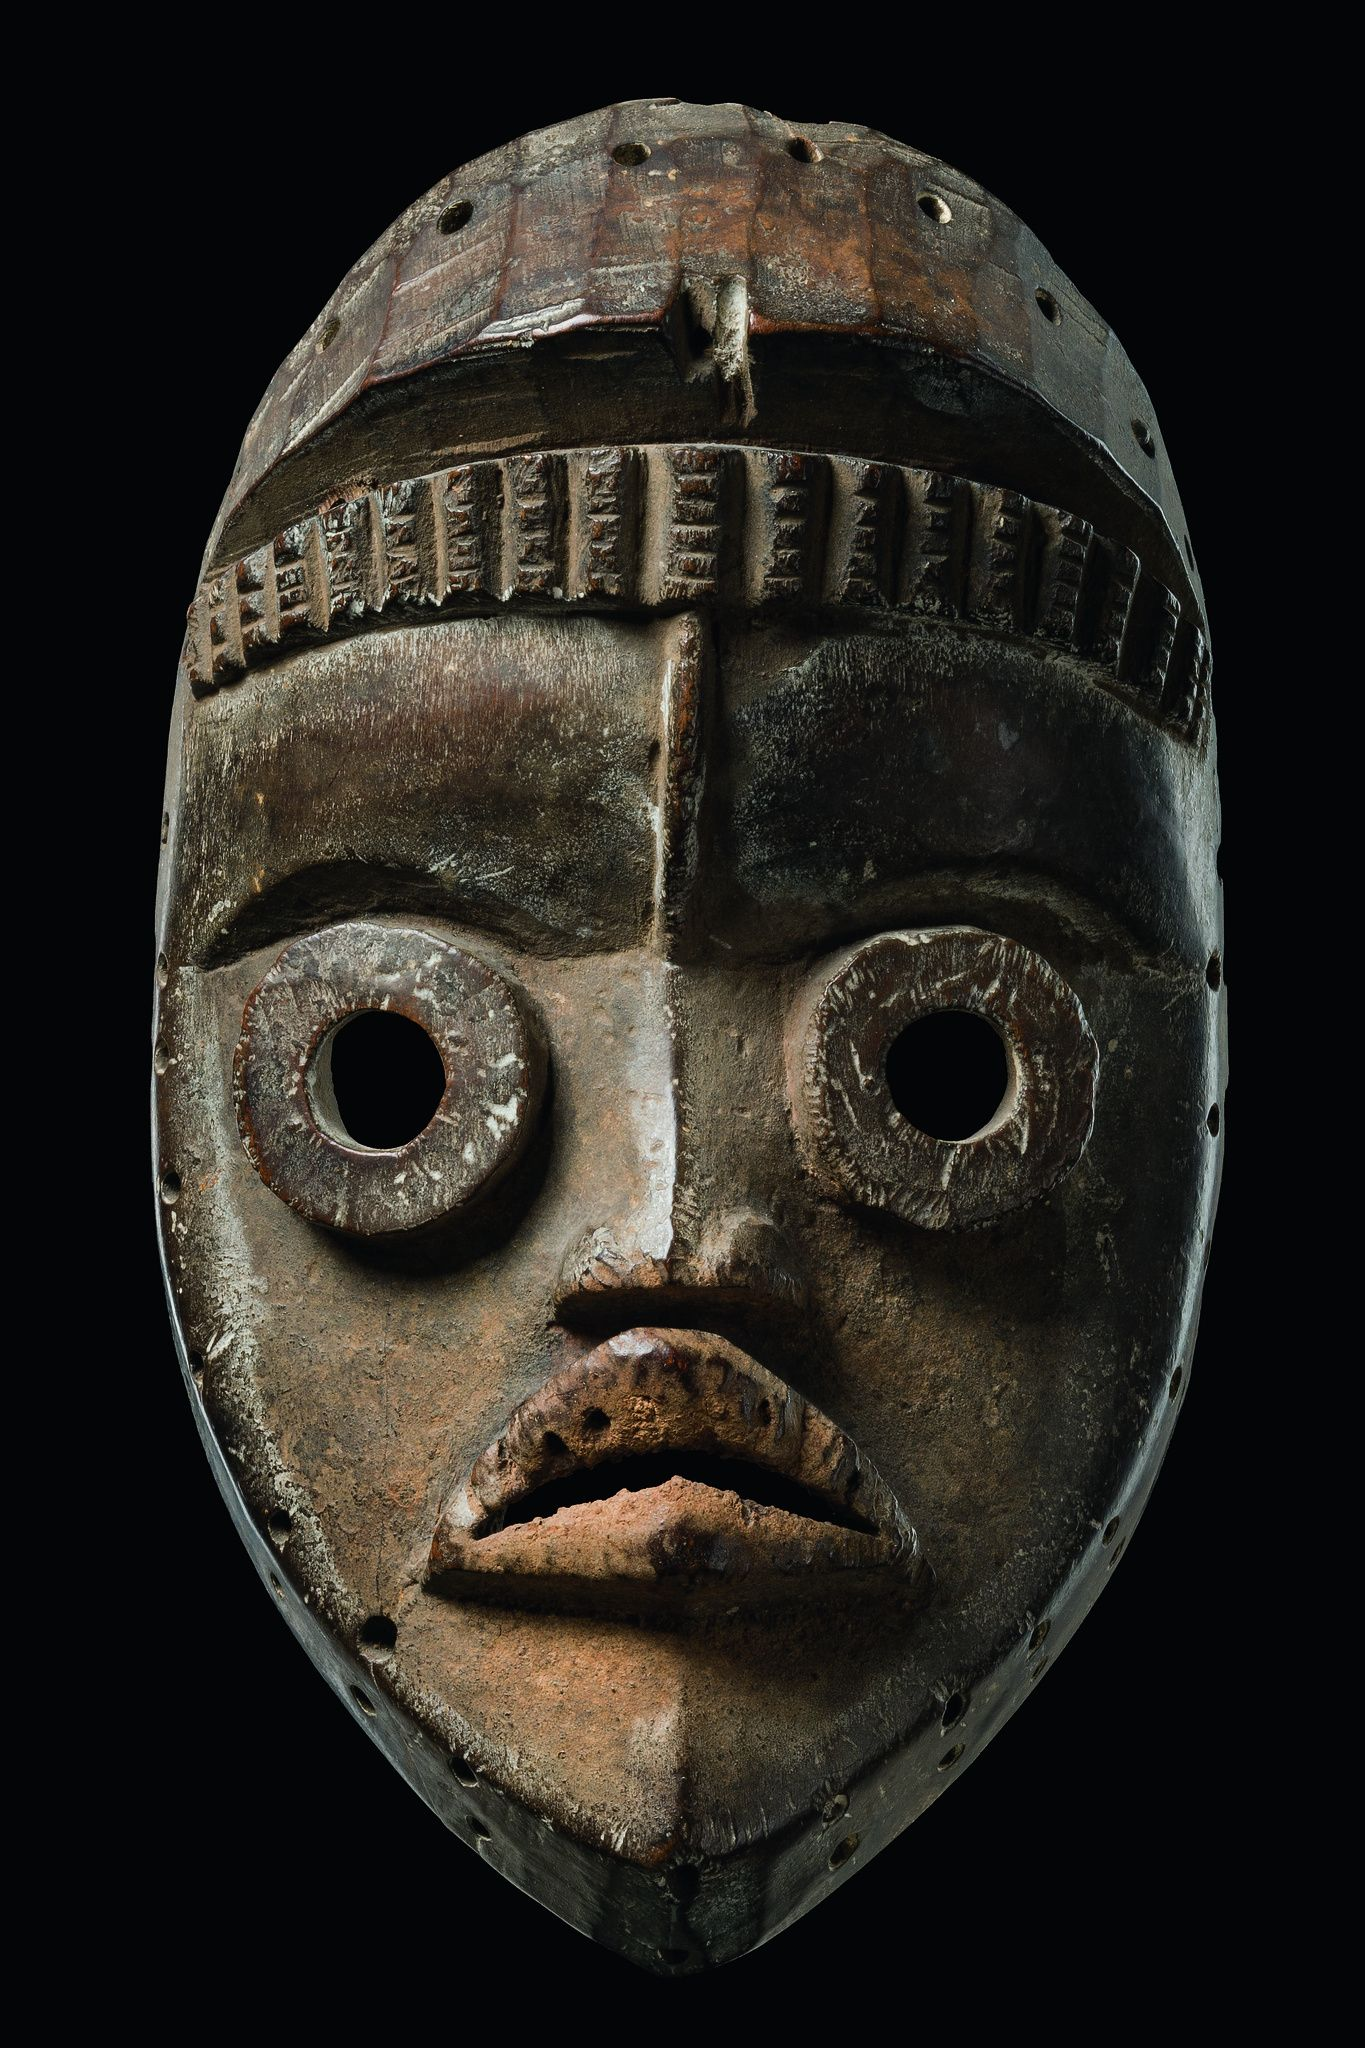 Dan Bagle Mask, Ivory Coast http://afriart.tumblr.com/post/91662340294/ivory-coast-dan-bagle-dancing-mask